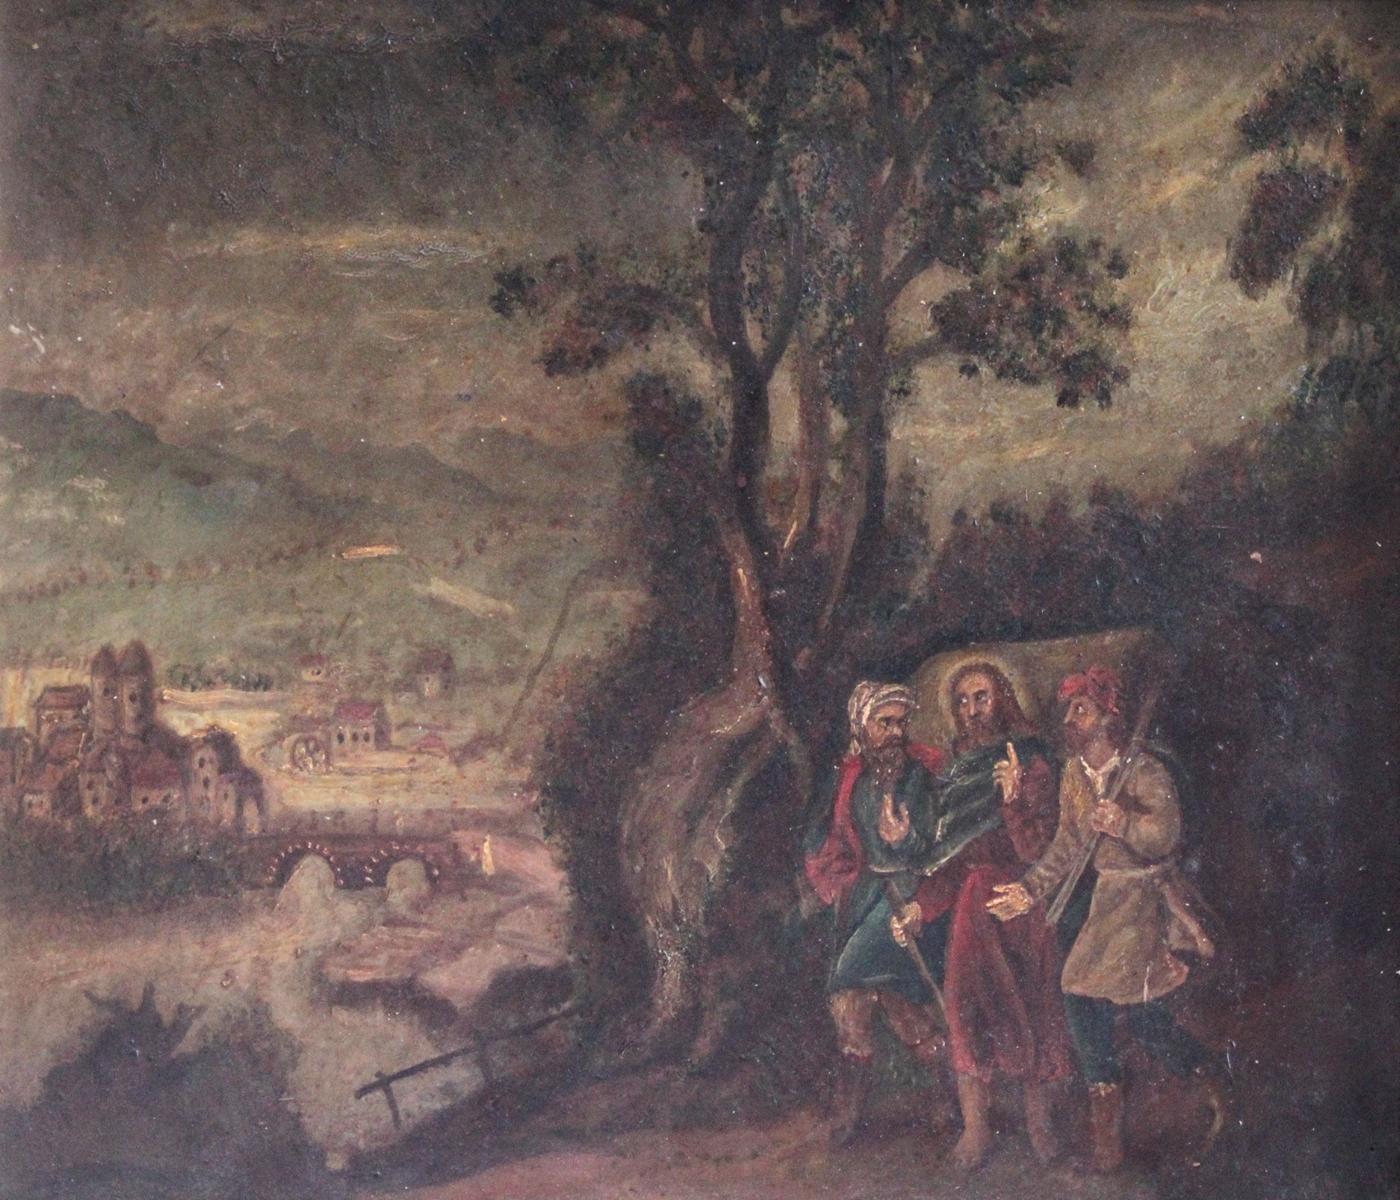 Religiöses Gemälde, 19. Jahrhundert. Unbekannter Künstler-3